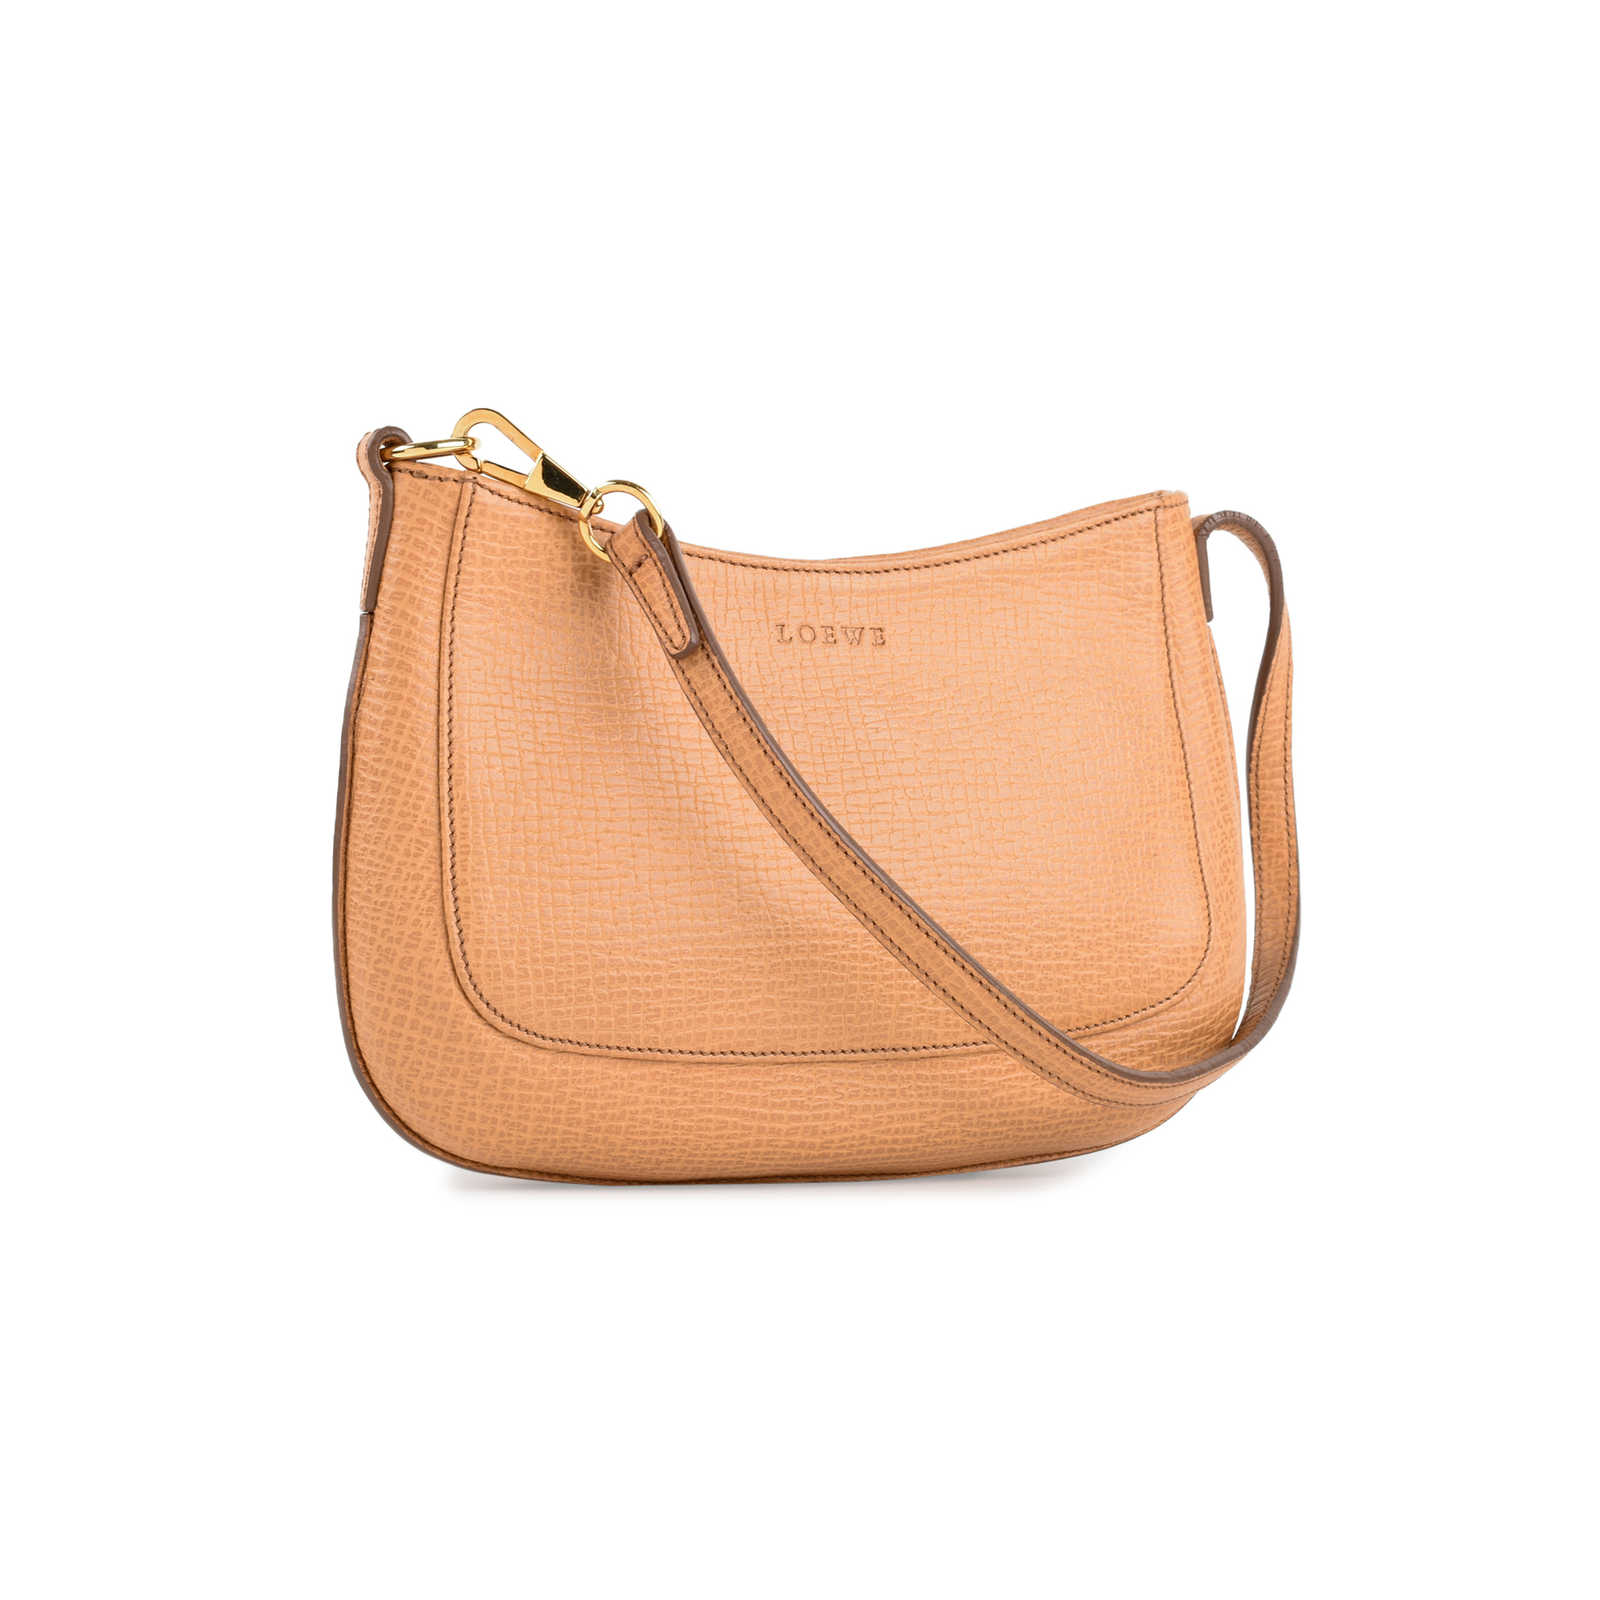 6a6009c1c9 ... Authentic Second Hand Loewe Mini Shoulder Bag (PSS-440-00006) -  Thumbnail ...